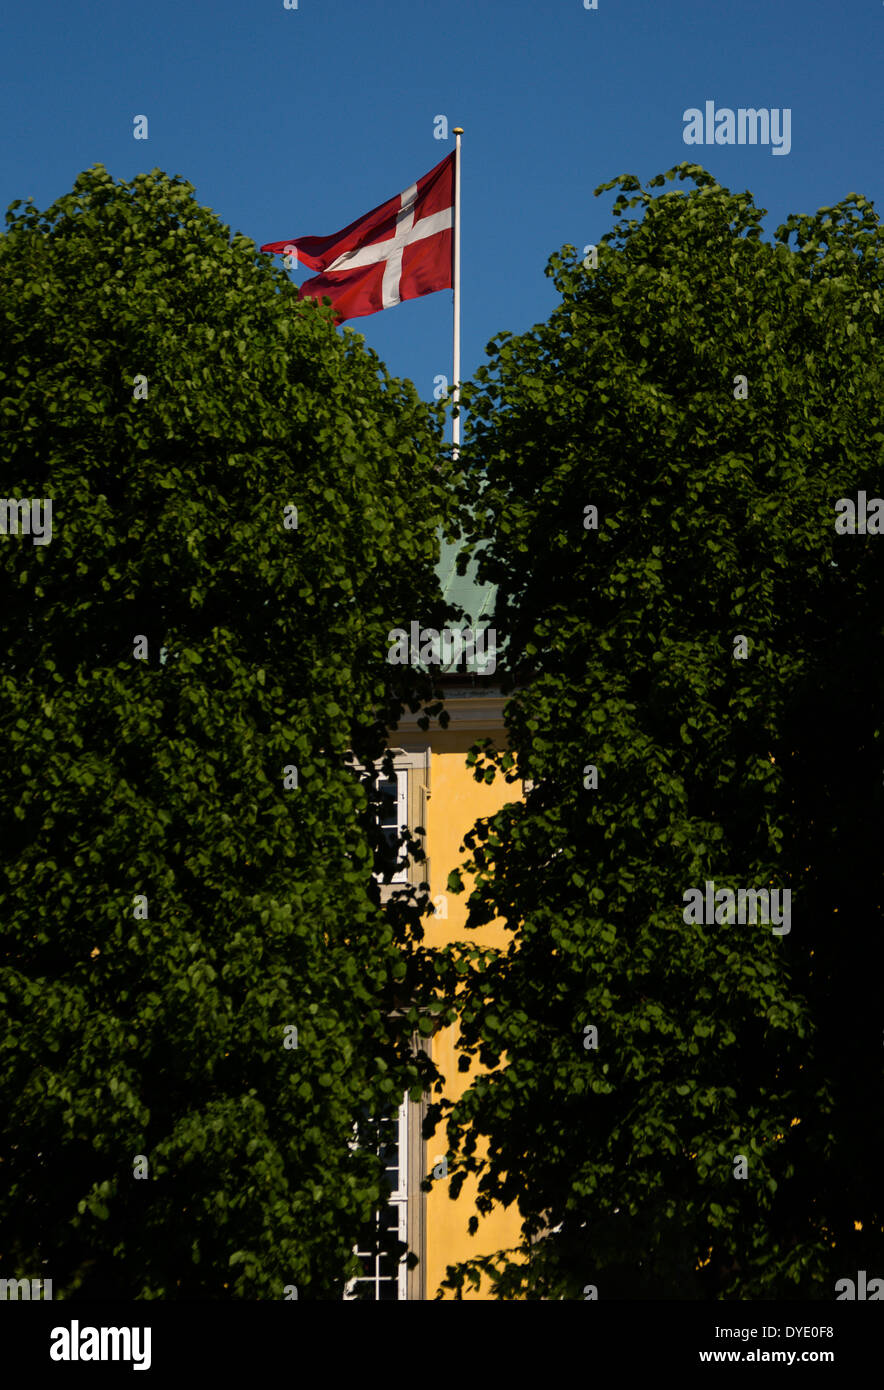 The Danish flag, Dannebrog, on a blue sky between green trees - Stock Image